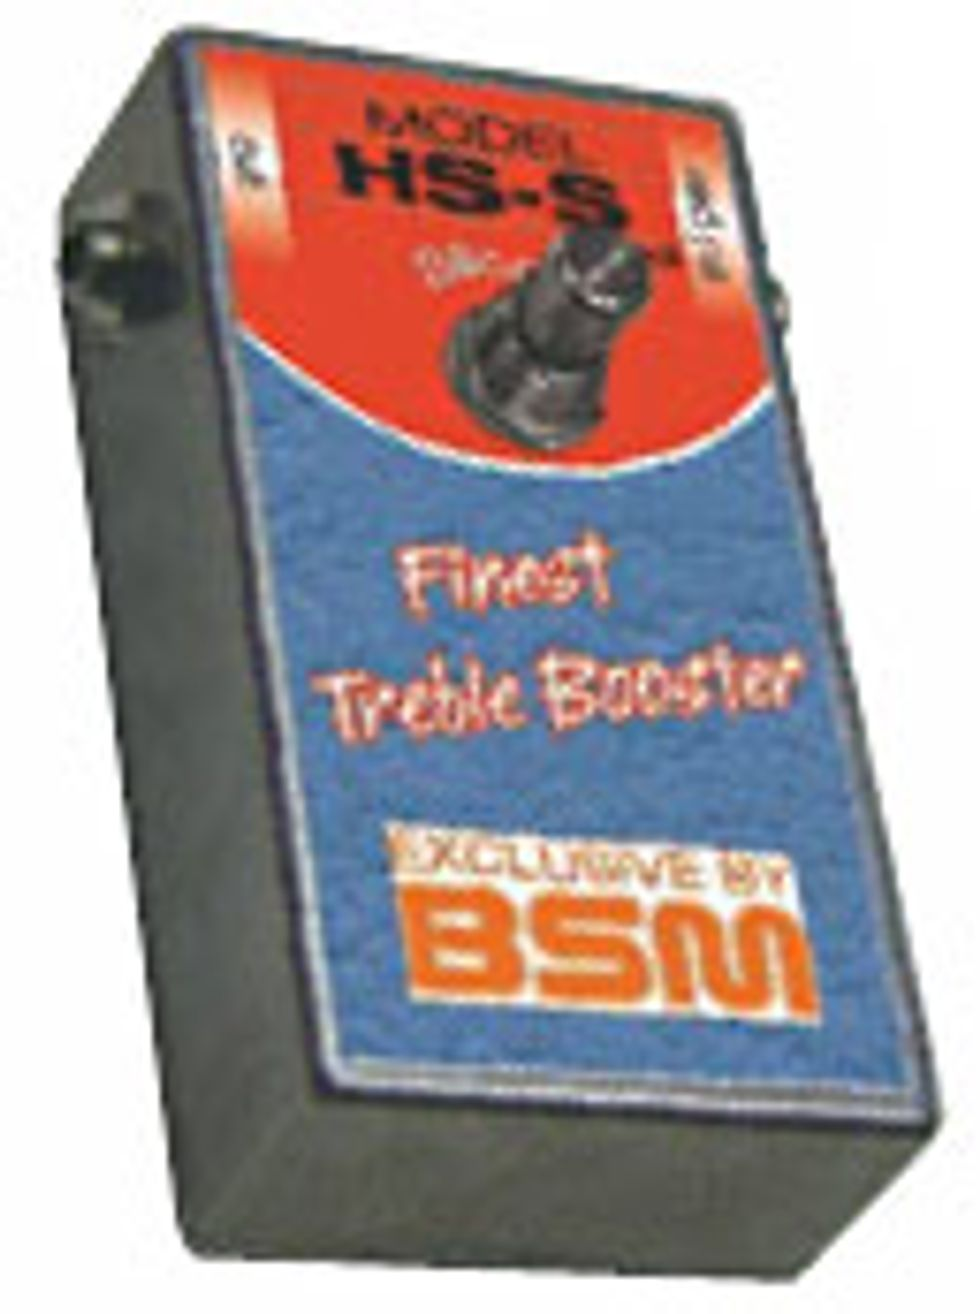 BSM HS-S Treble Booster